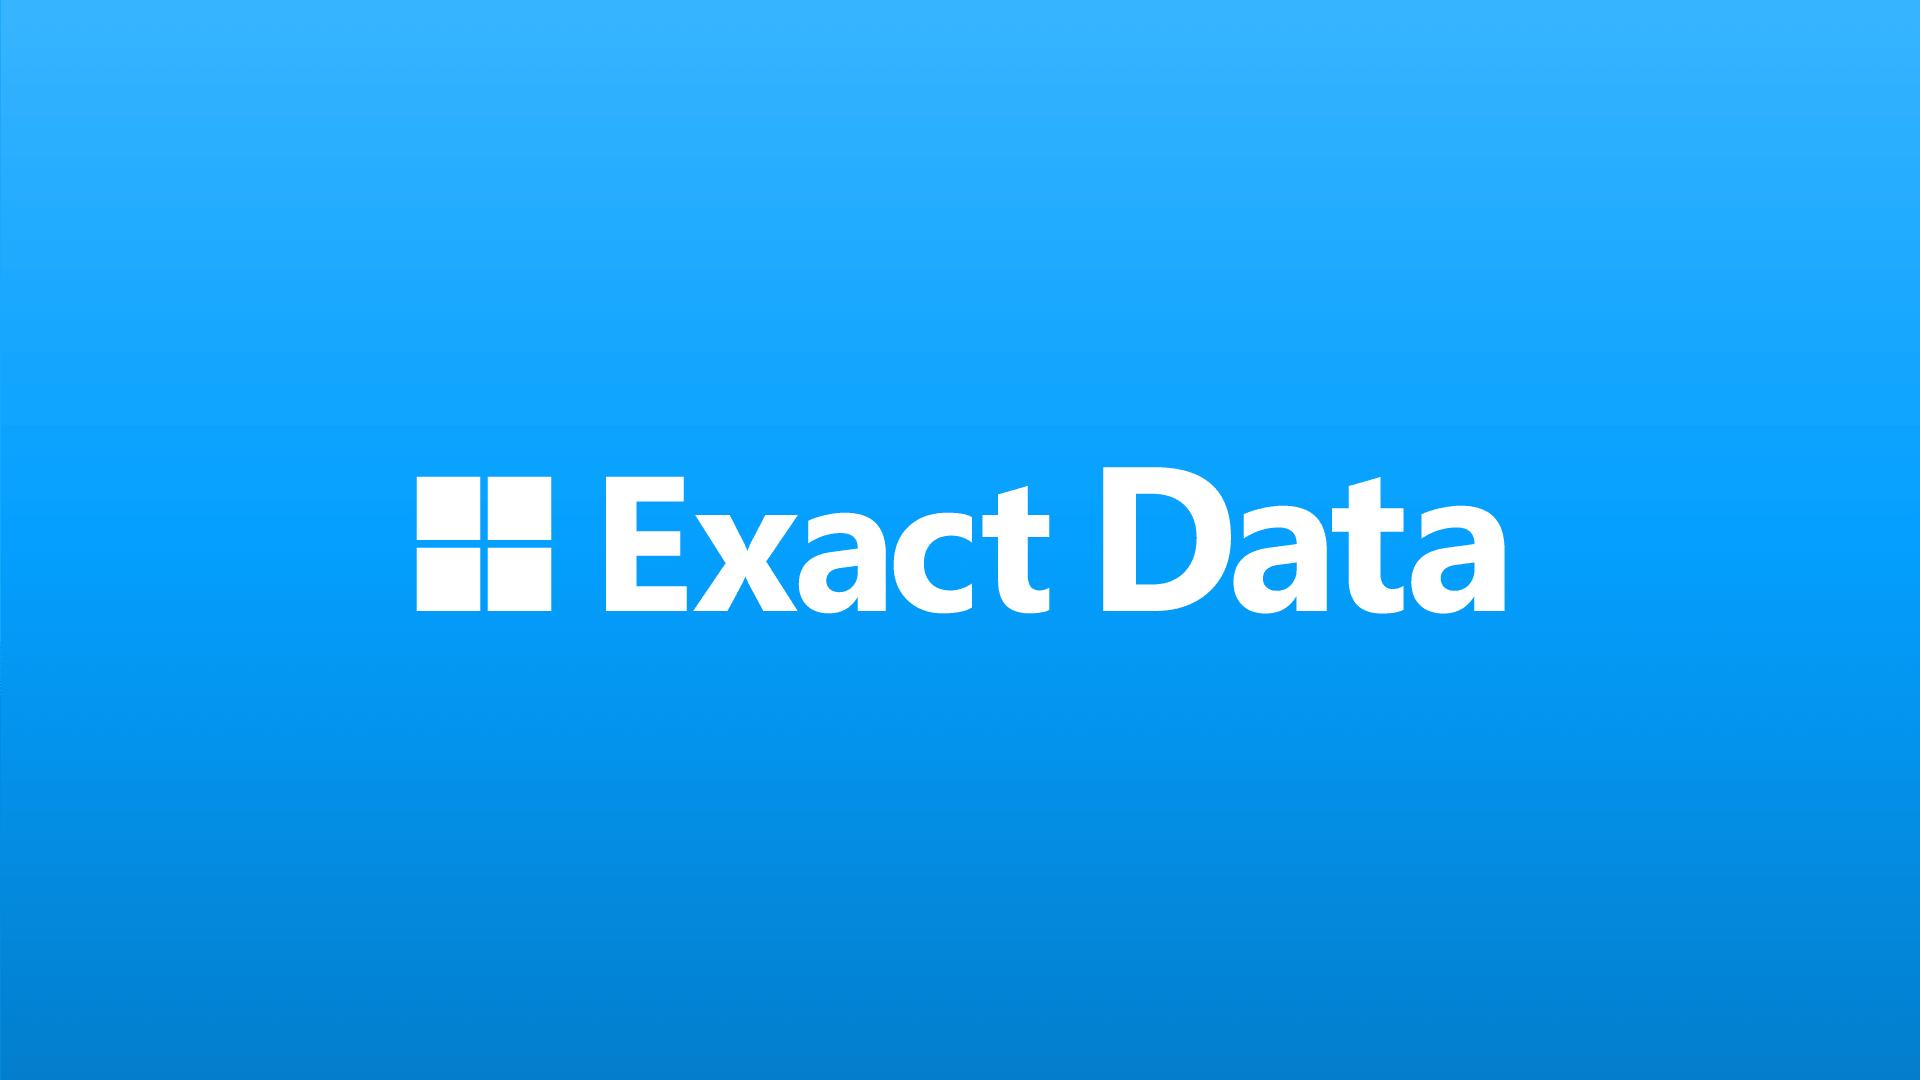 Exact Data Dedicated Team